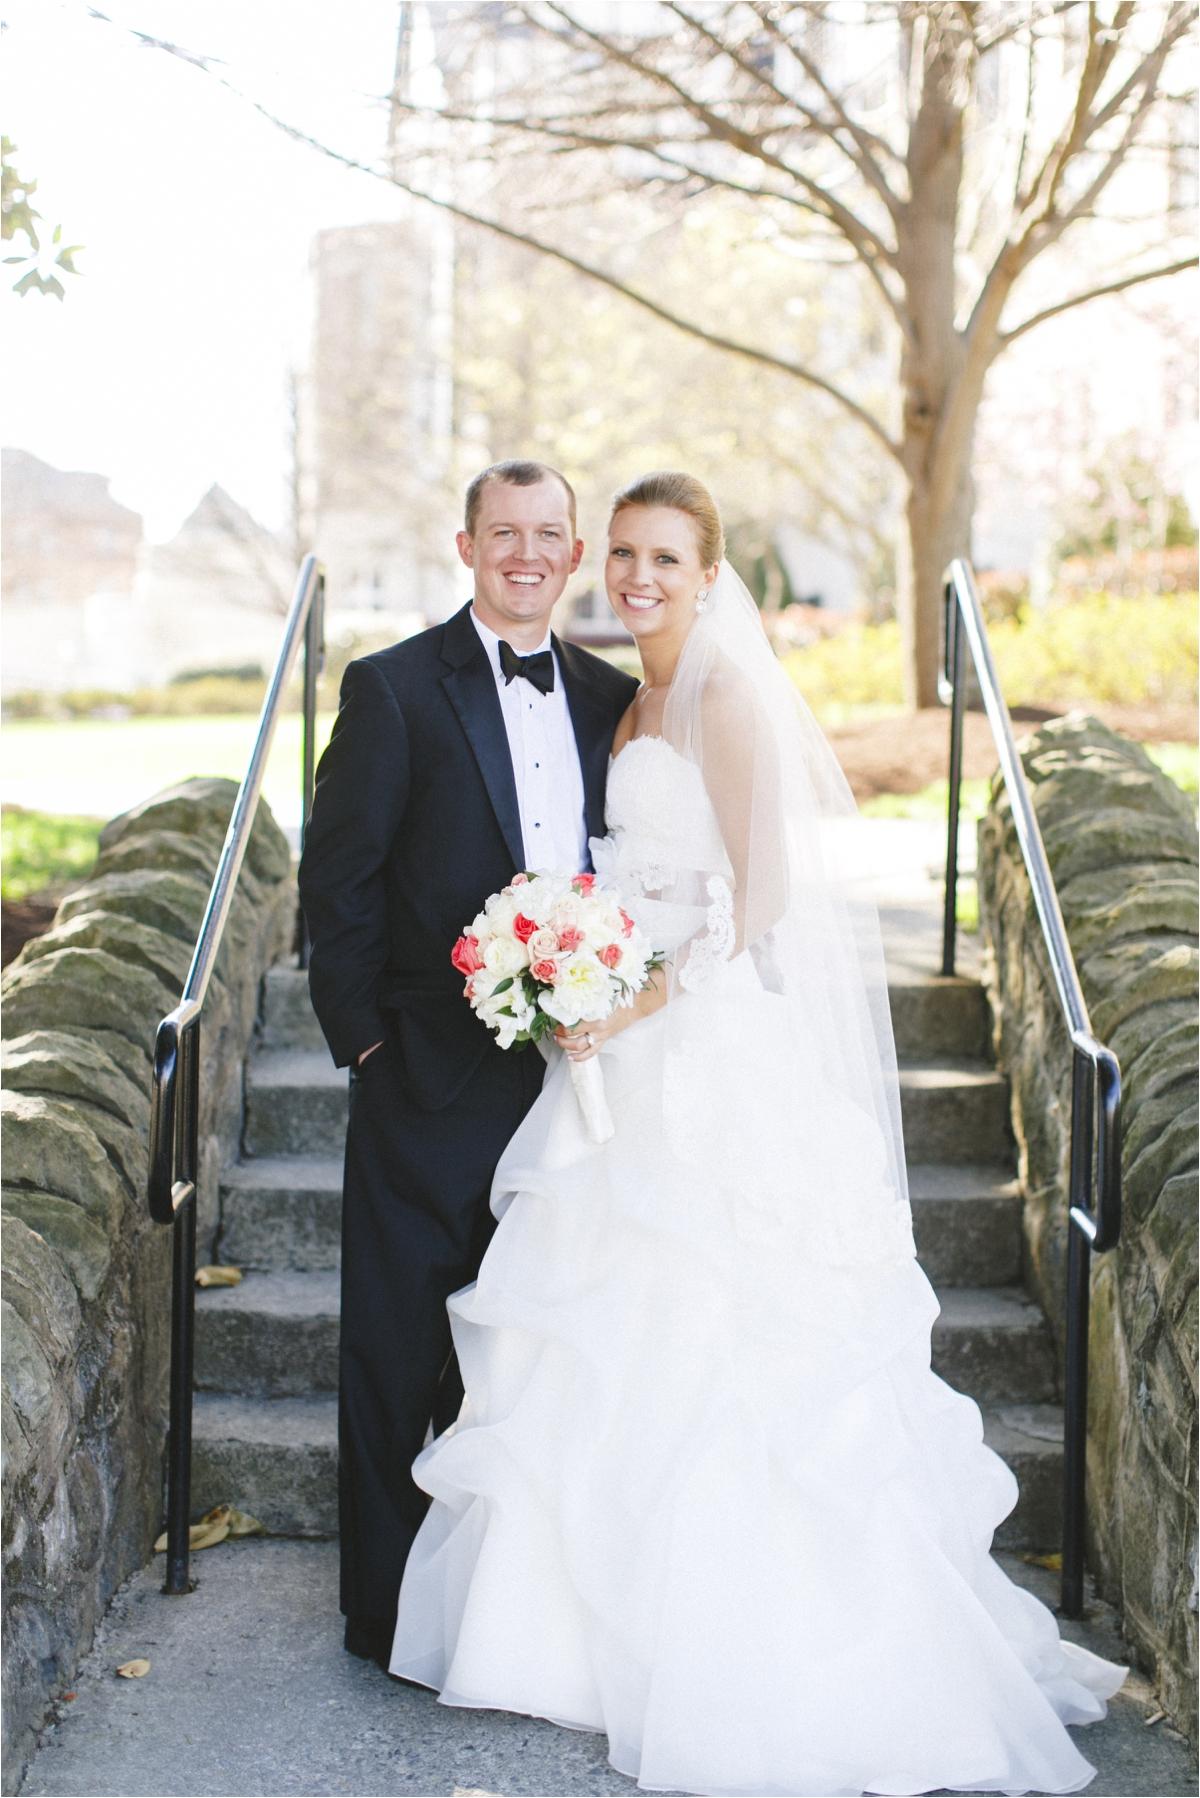 jaclyn-ryan-classic-hotel-roanoke-virginia-wedding-_0047